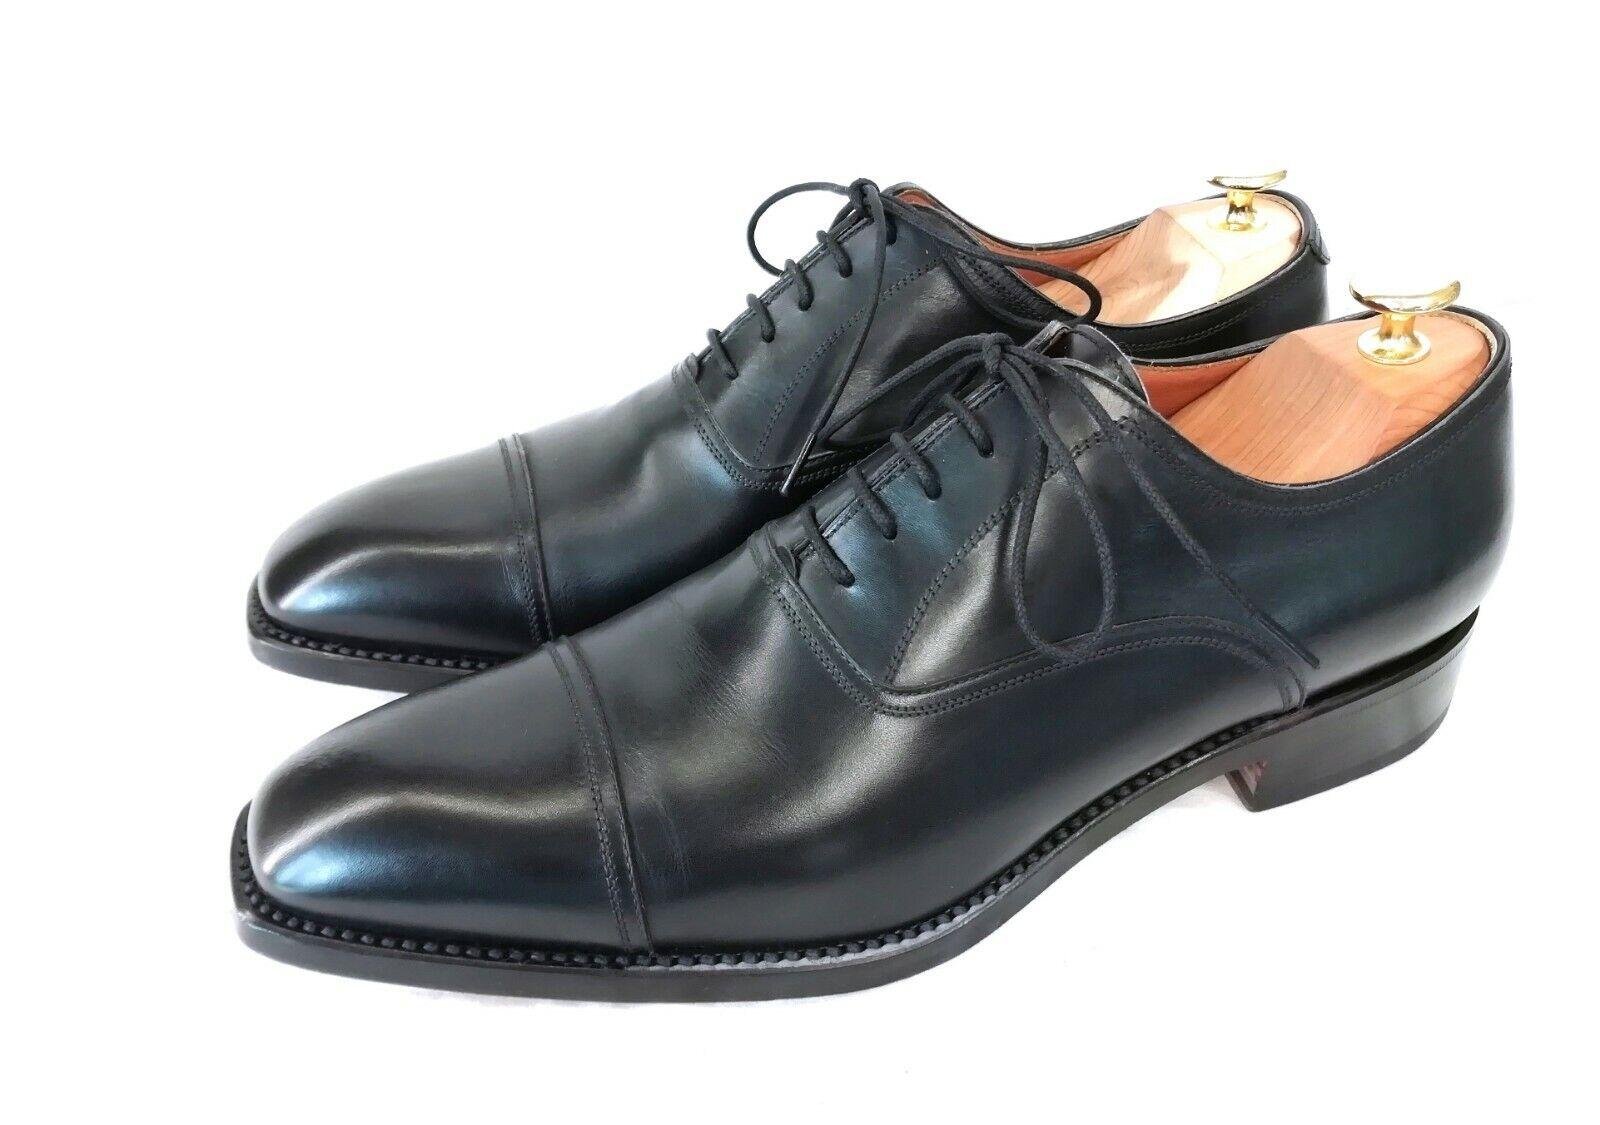 FRANCESCHETTI Luxuriöse Cap Toe Oxford Business Herrenschuhe Herrenschuhe Herrenschuhe Schwarz Leder Gr 43  erstklassiger Service